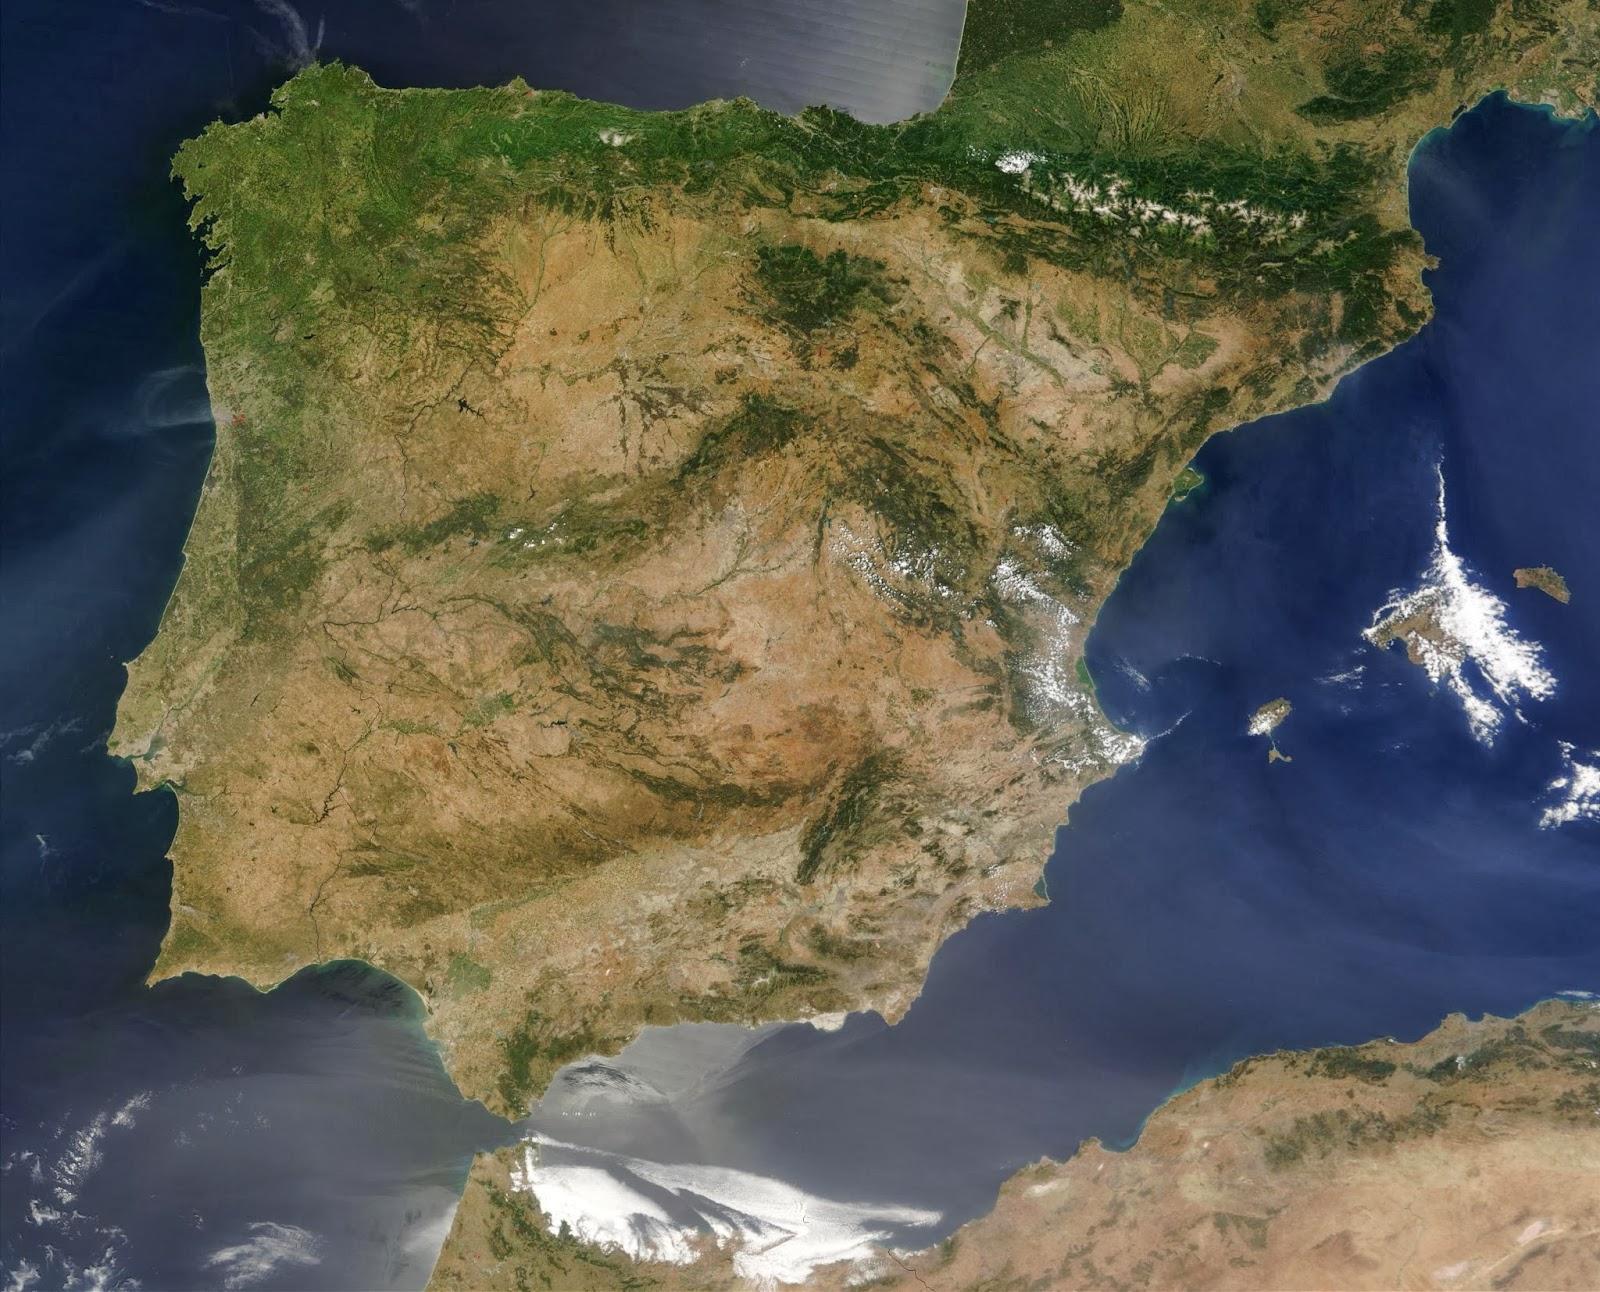 http://cplosangeles.juntaextremadura.net/web/cono_tercer_ciclo/espana/actividades/indice.htm